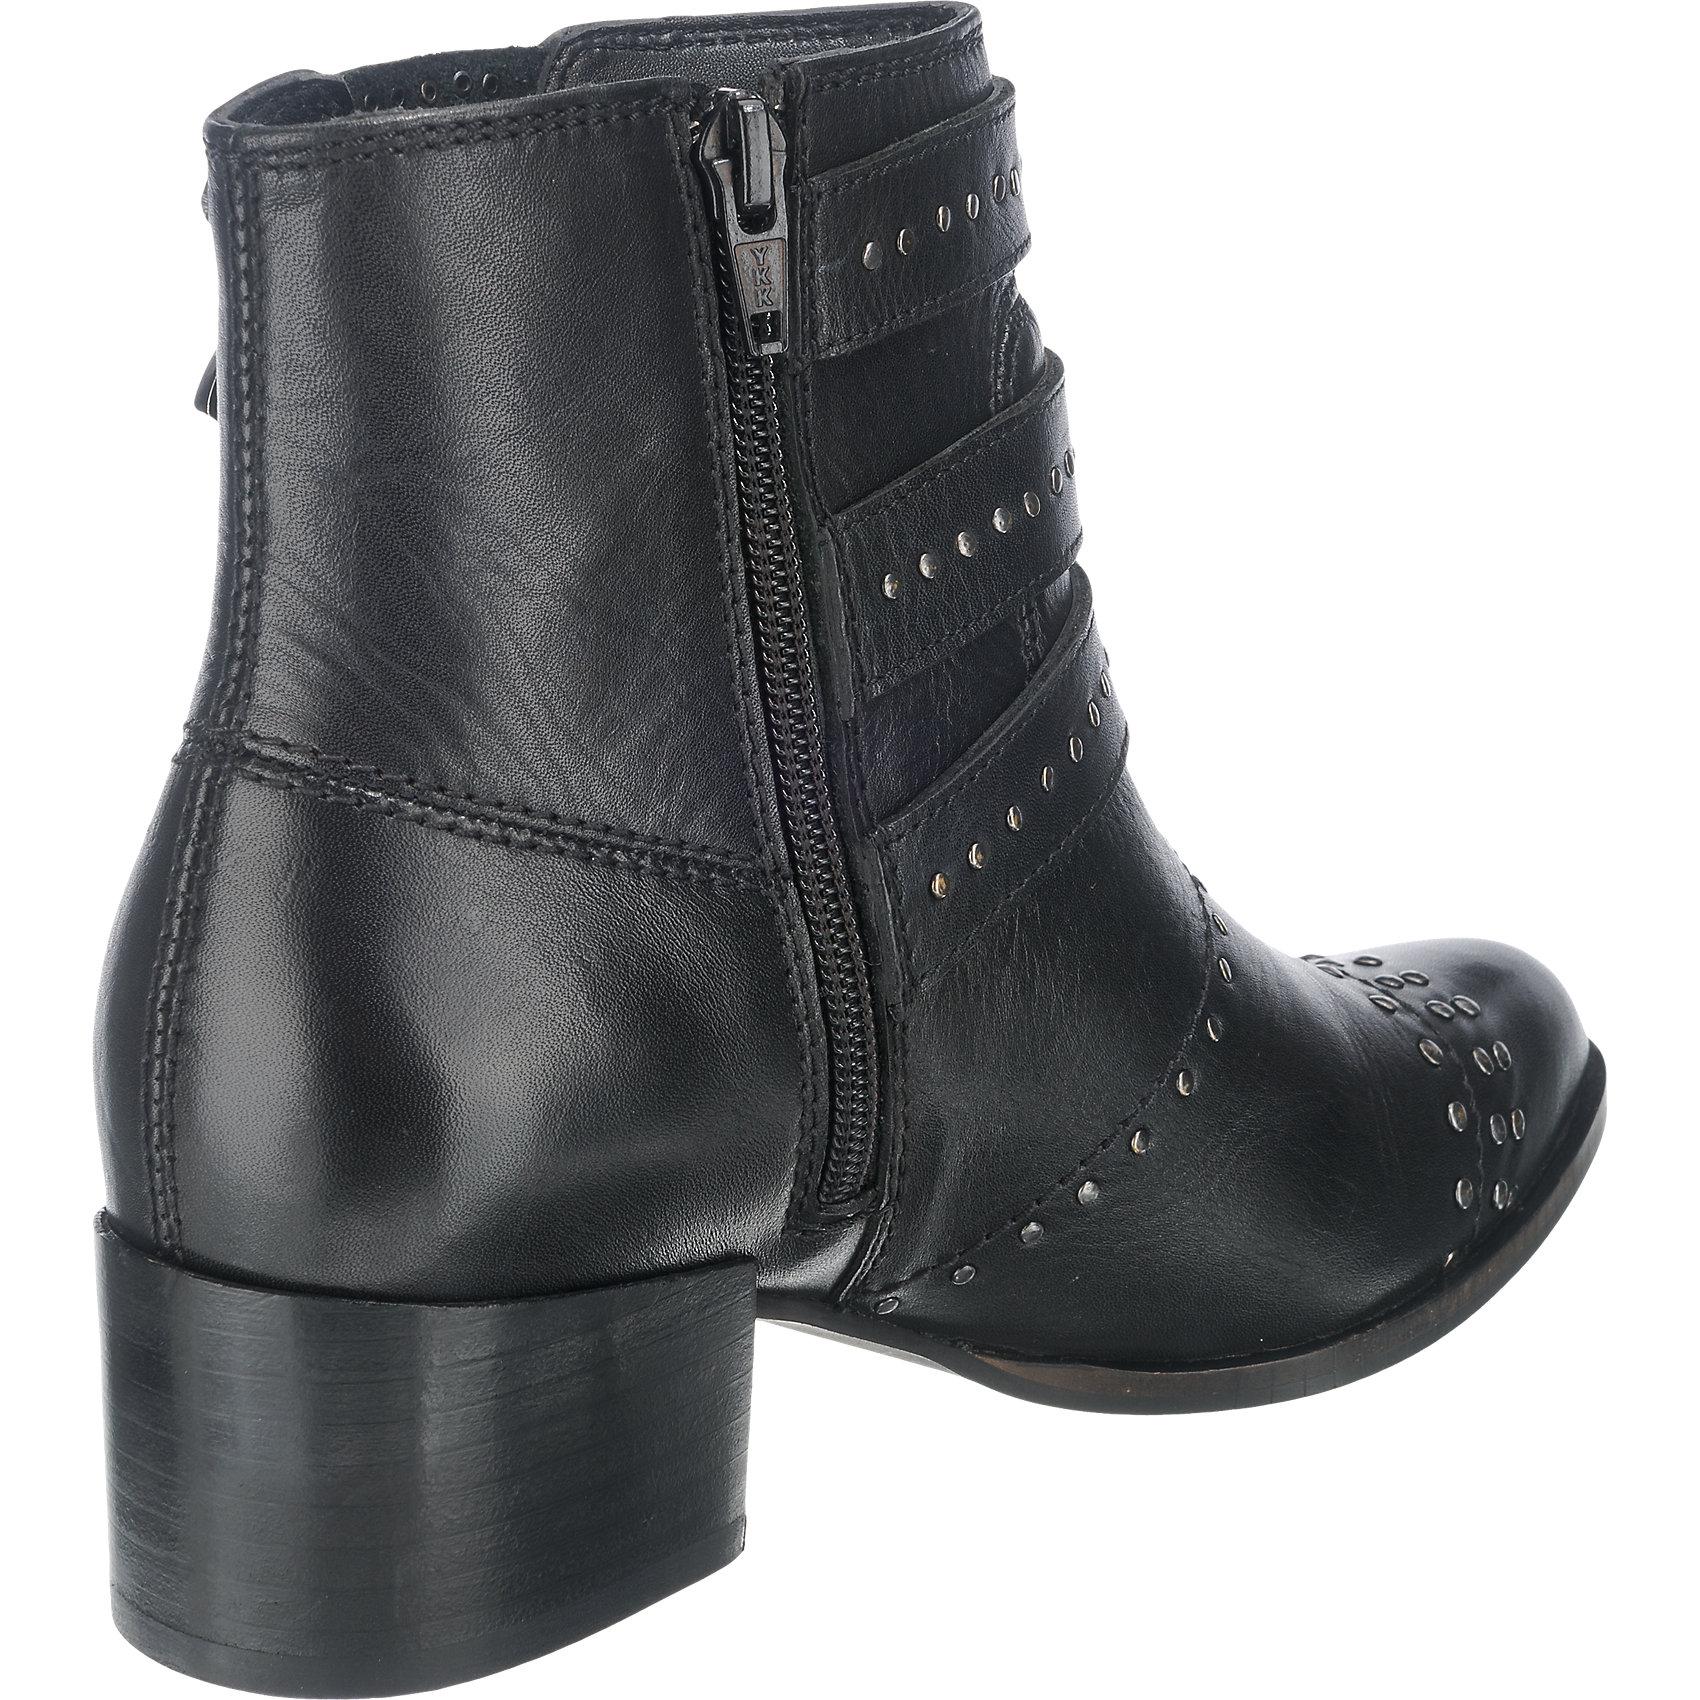 Neu Pepe Jeans Waterloo Rock Biker Boots 5777531 für Damen schwarz ... fa027461c7